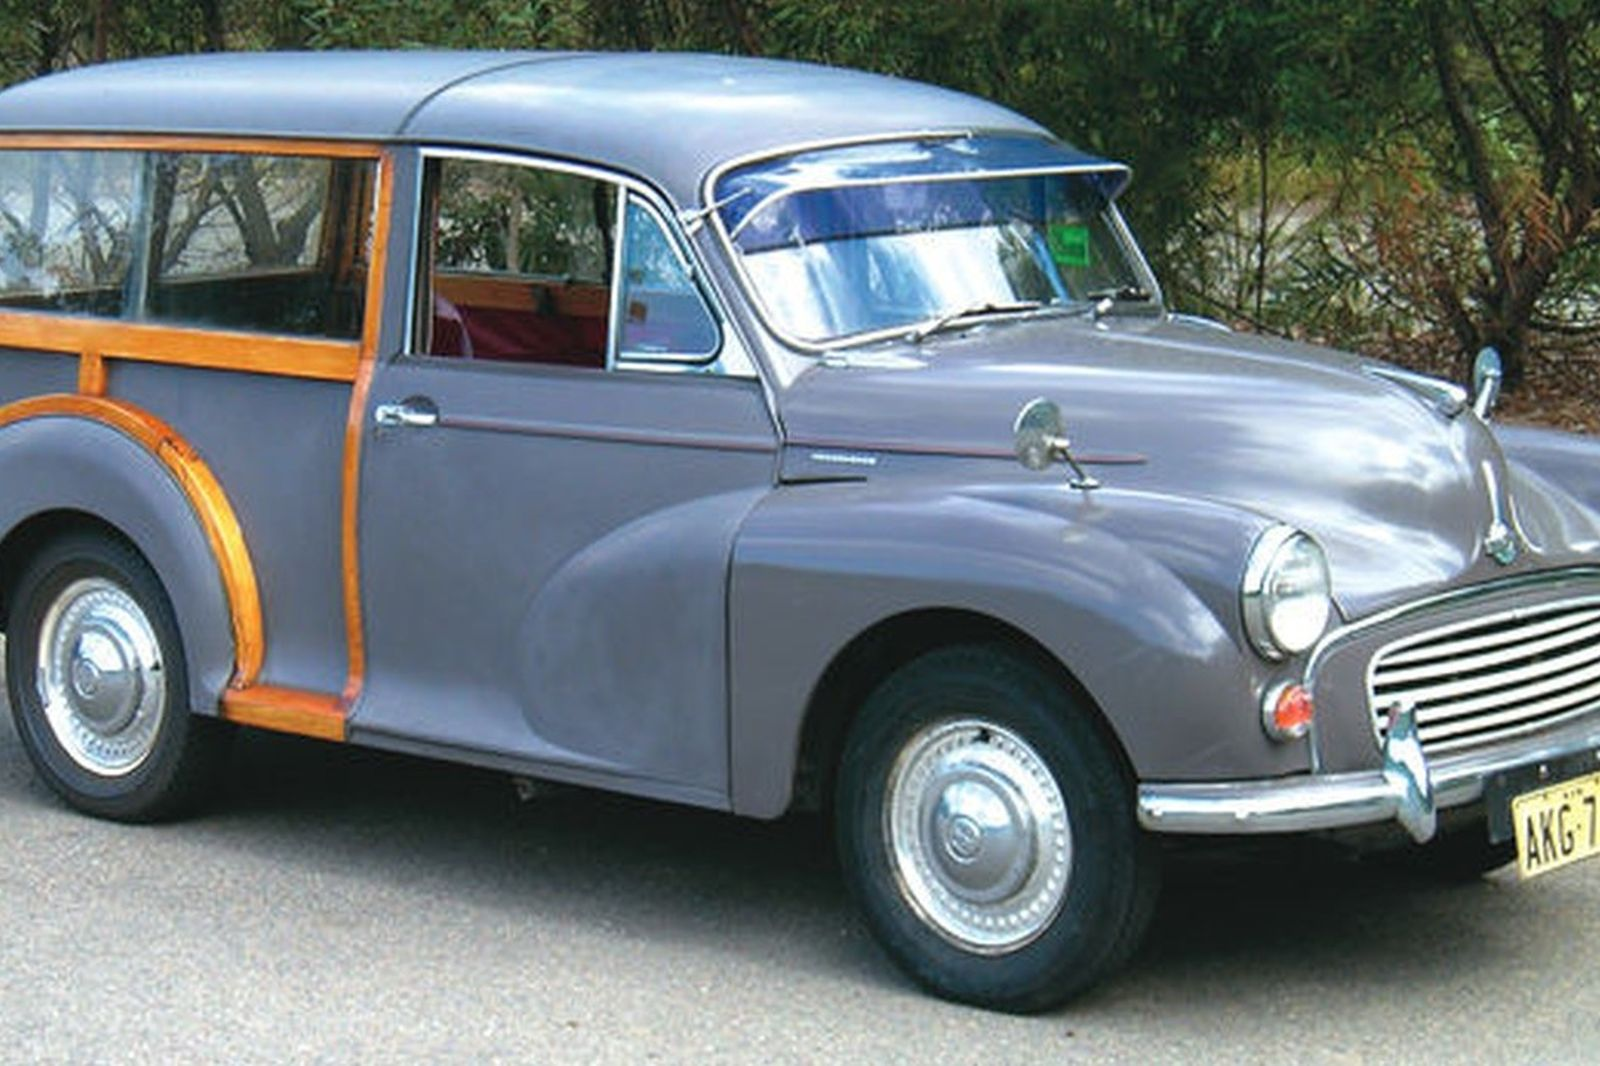 Morris minor traveller for sale - Morris Minor Traveller Wagon